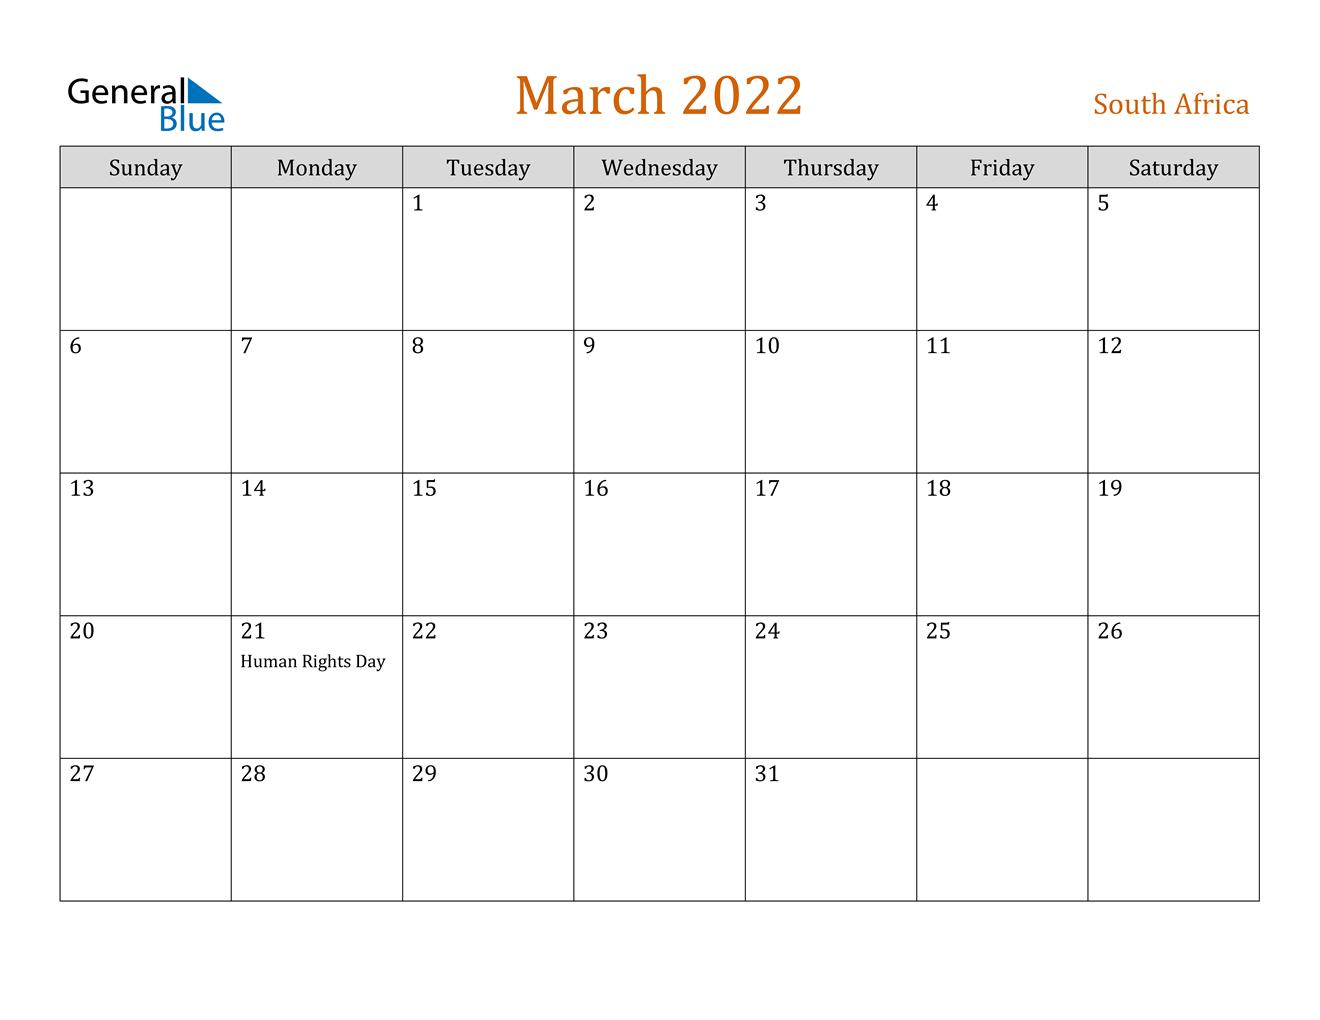 March 2022 Calendar - South Africa